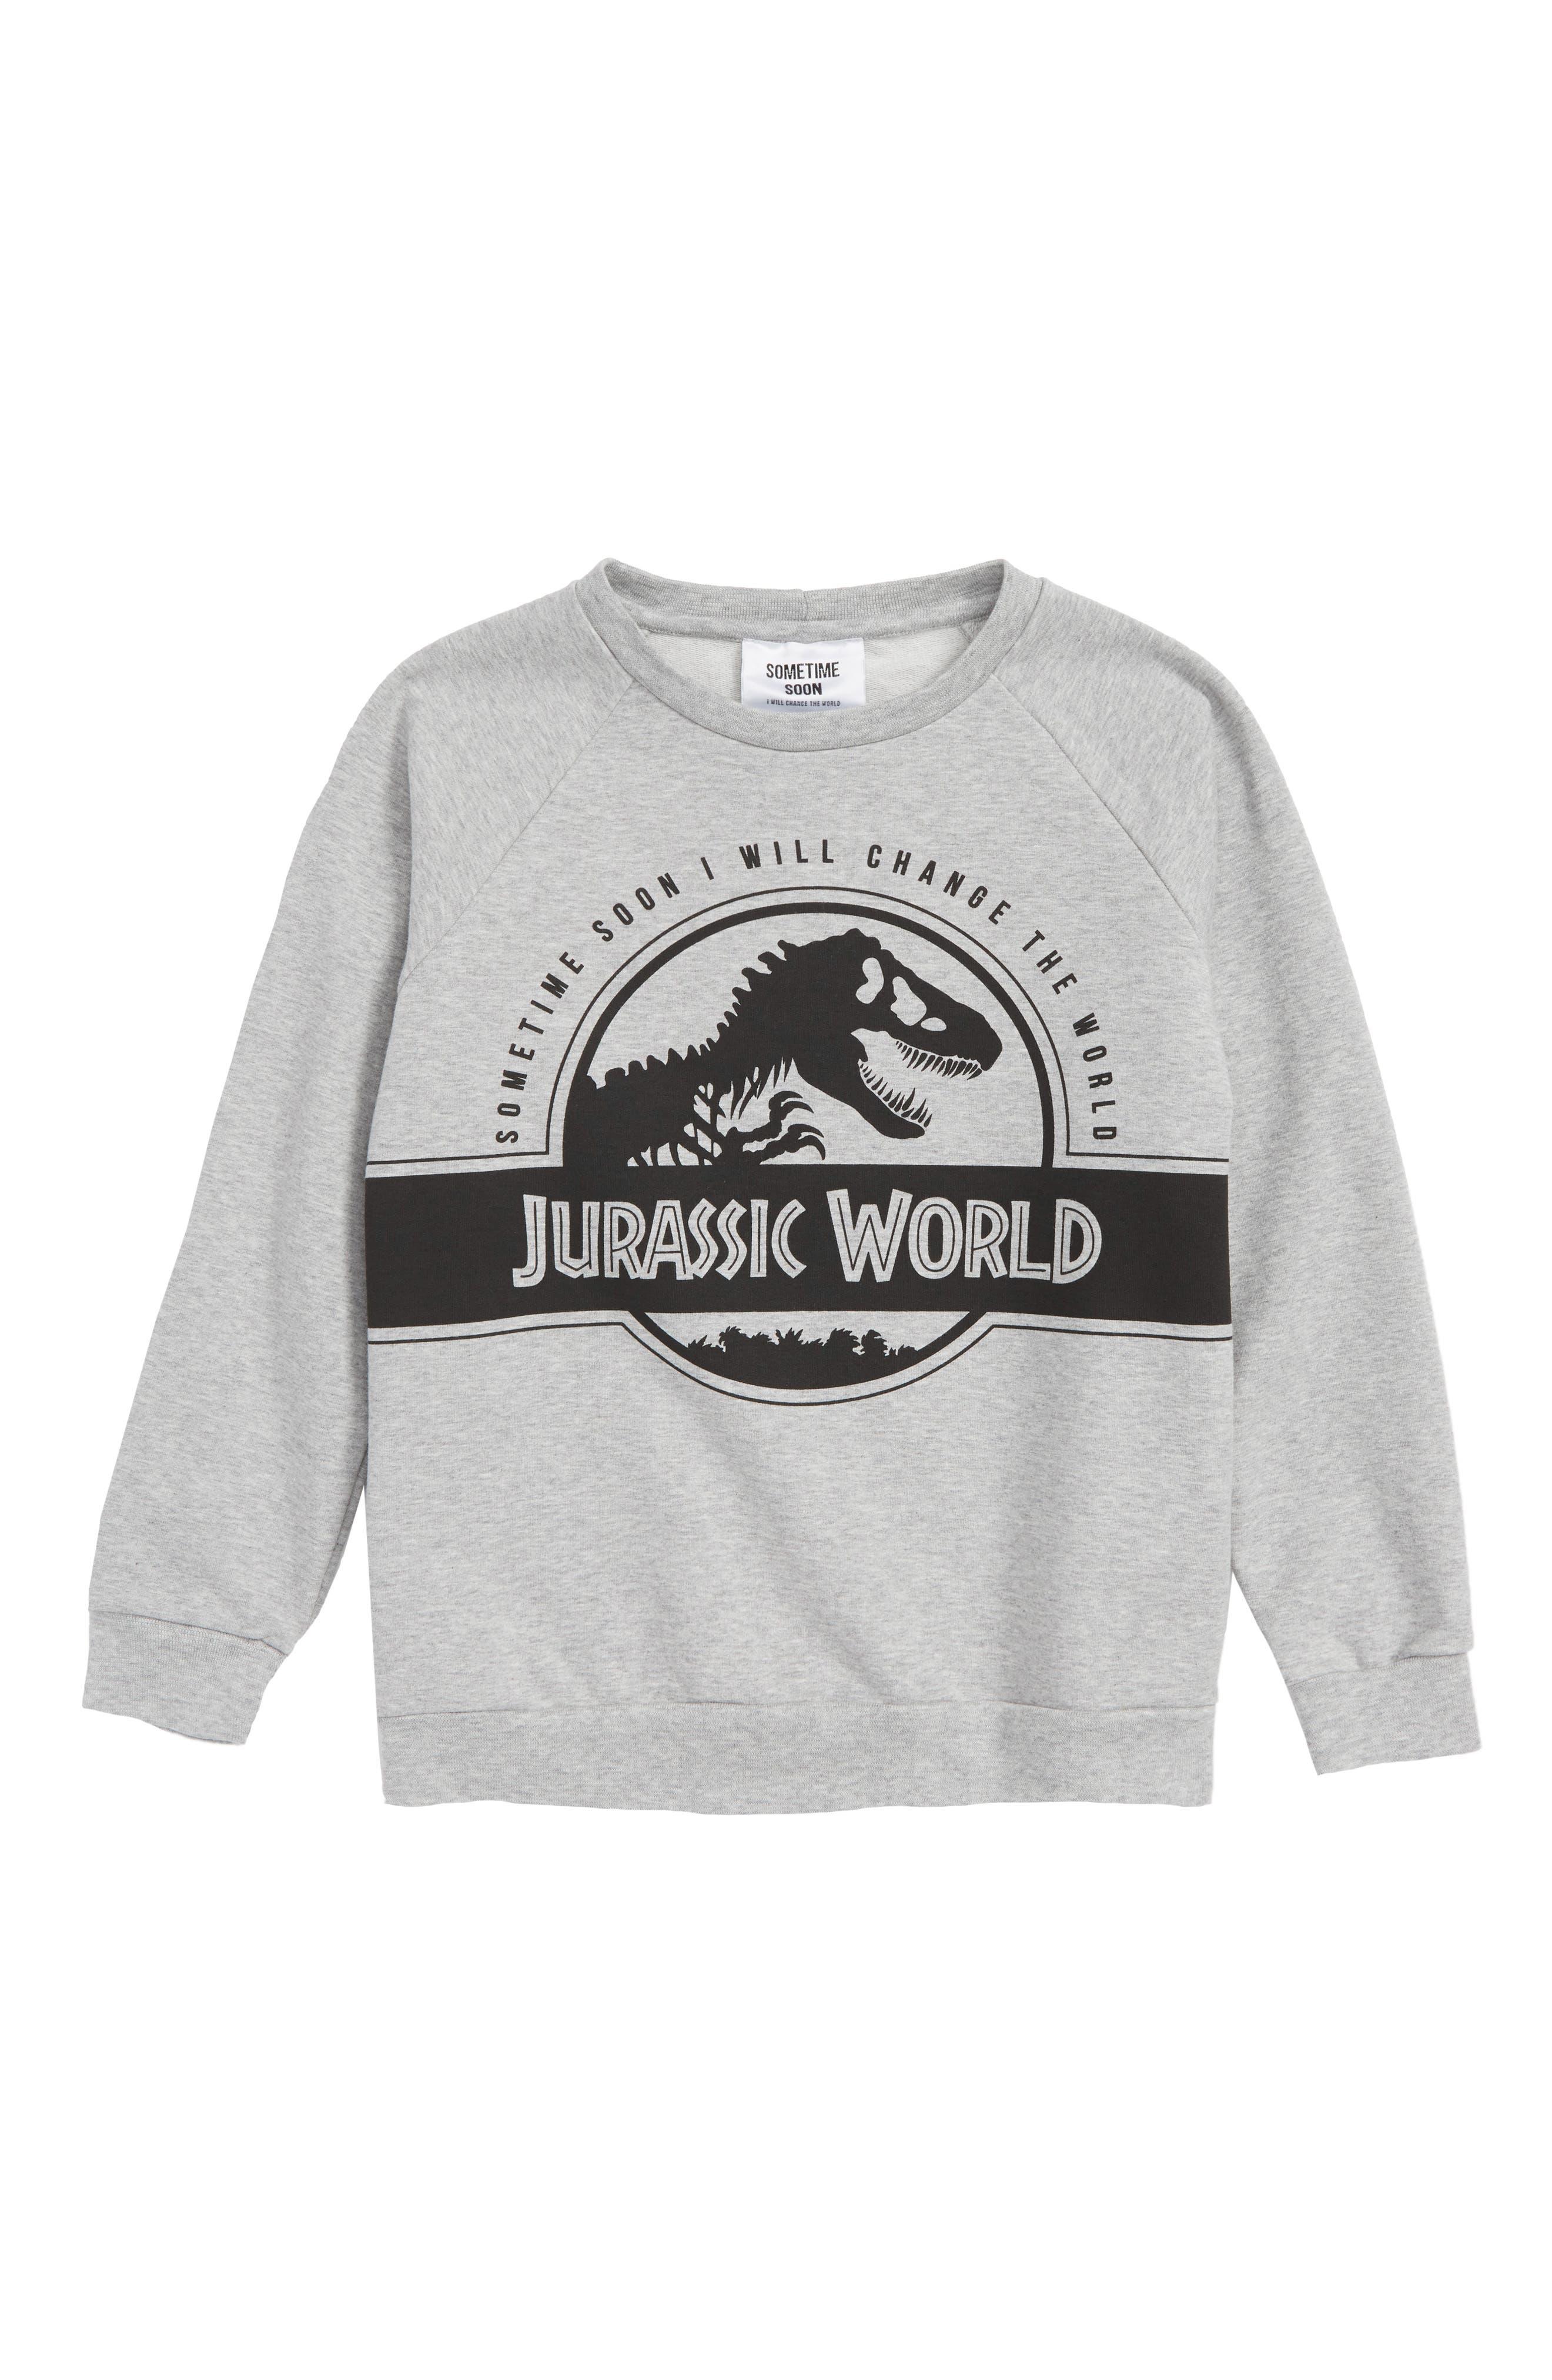 x Jurassic World Rex Graphic Organic Cotton Sweatshirt,                             Main thumbnail 1, color,                             020